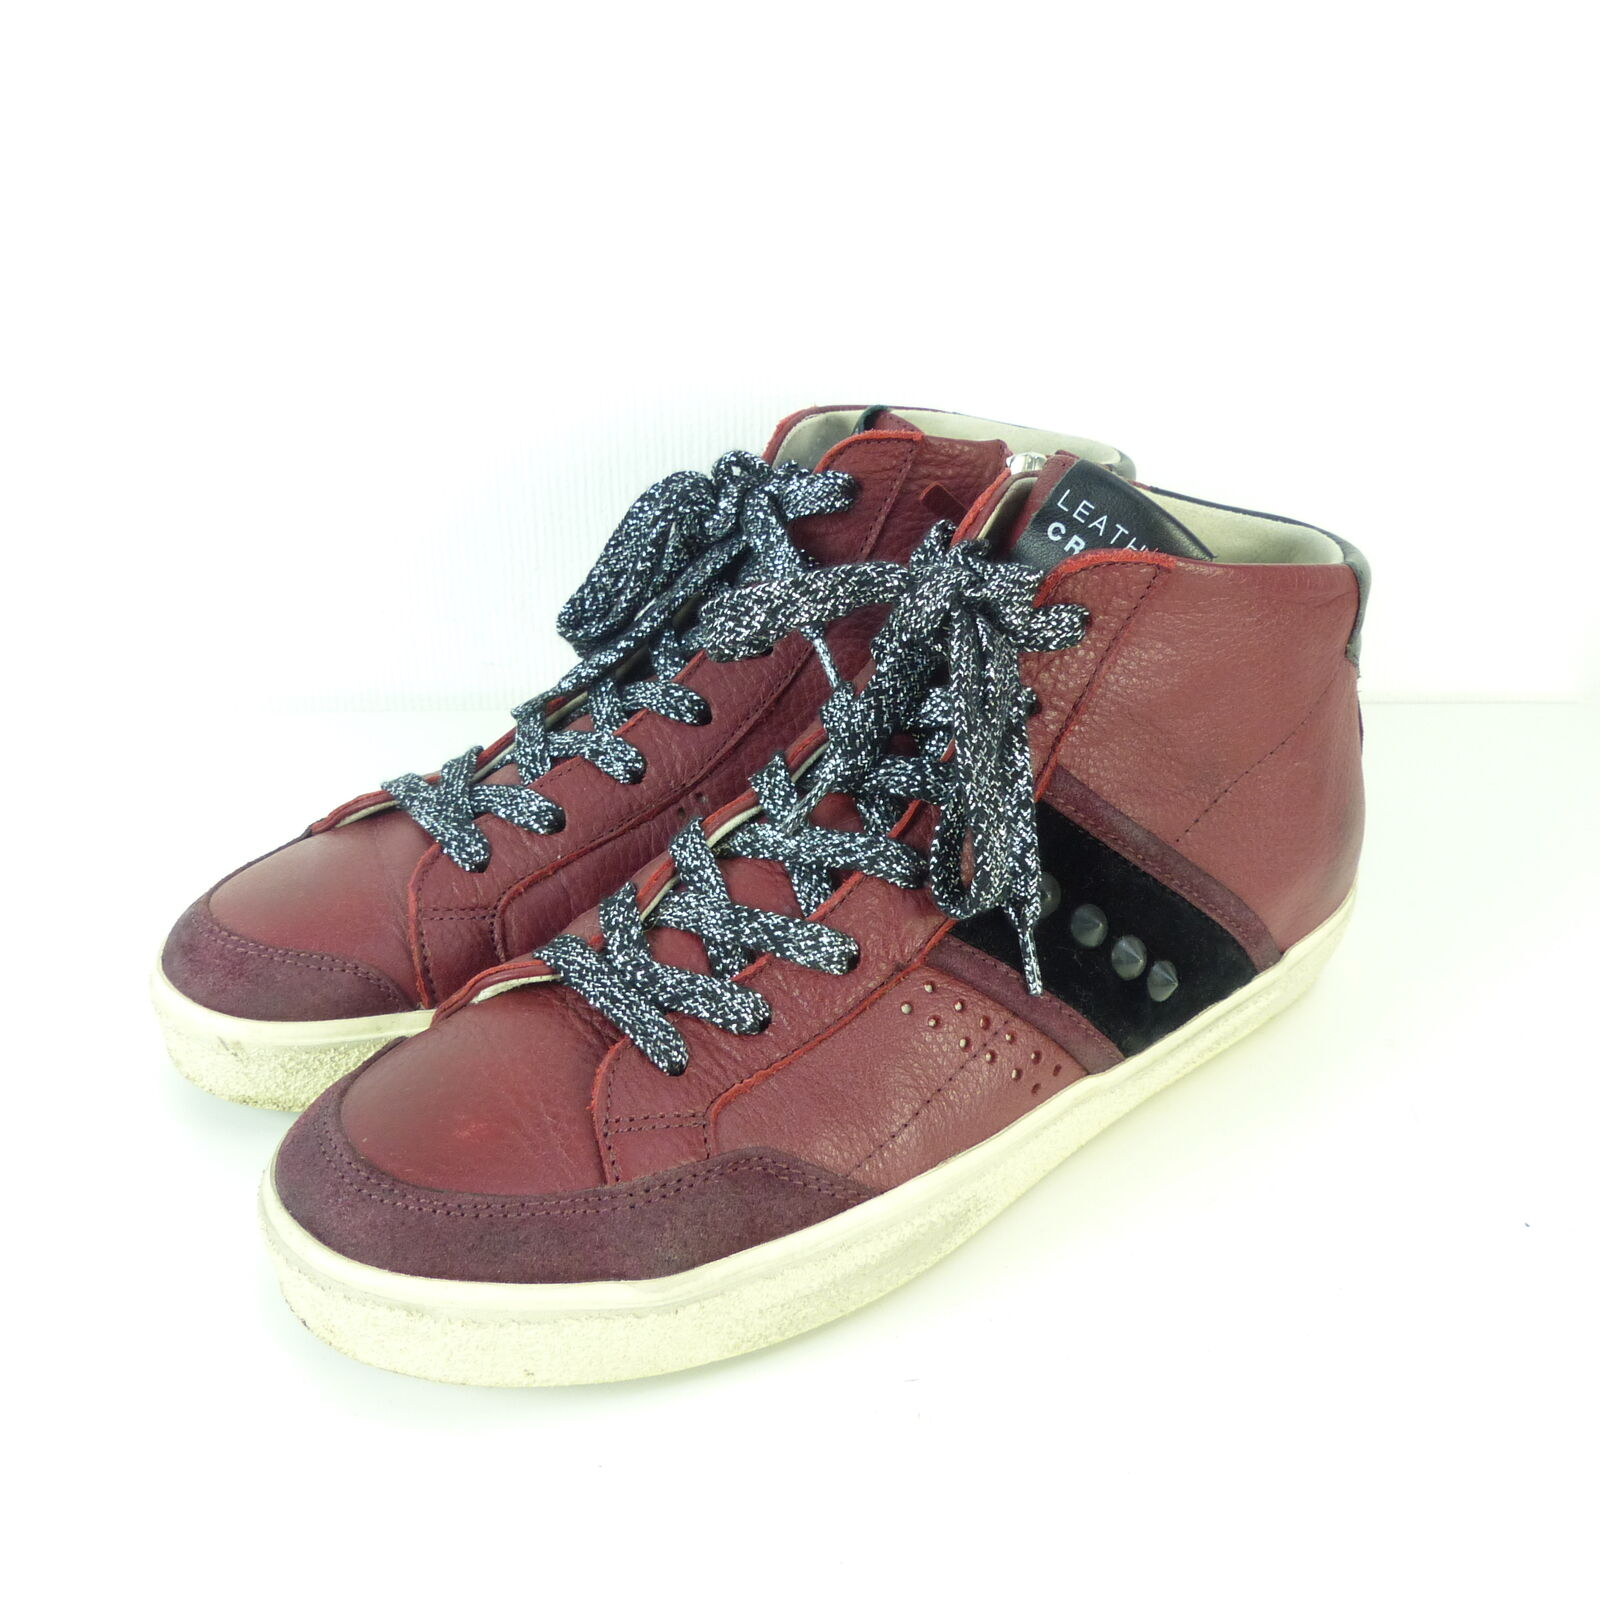 LEATHER Crown Sneaker High Nero Top Rivetti Pelle Rosso Nero High Mis. EUR 39 (h59) 78812a